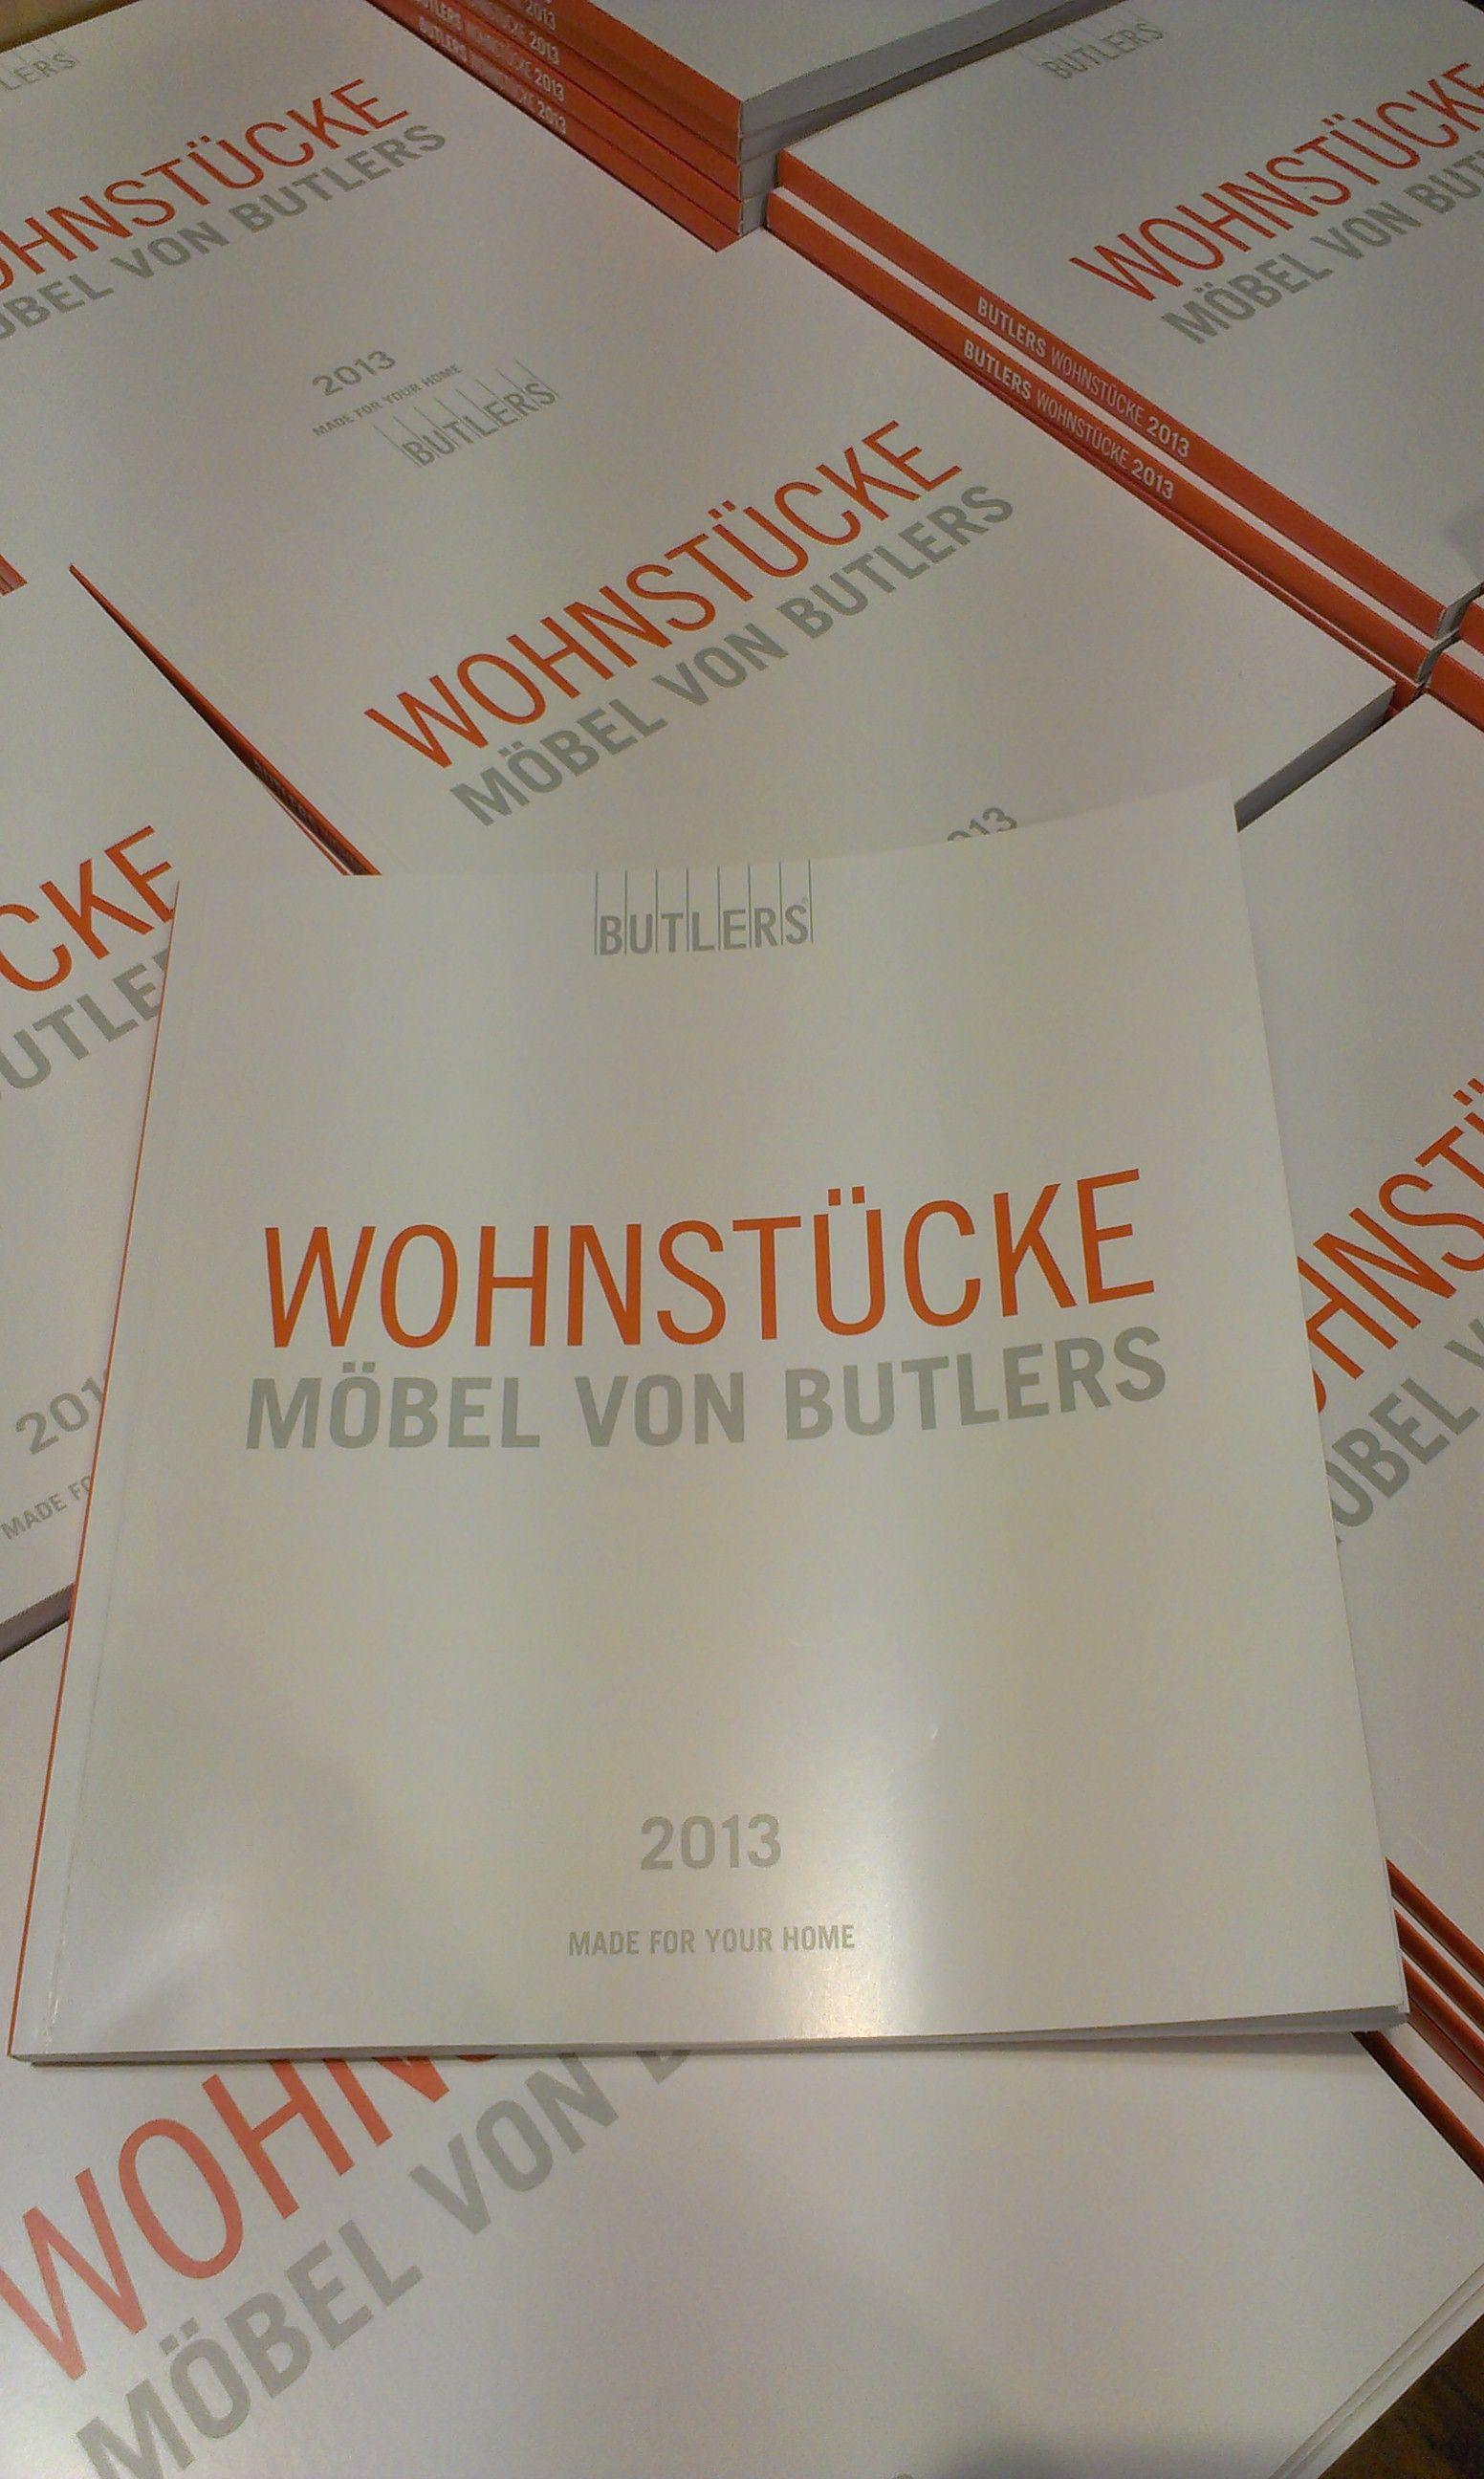 Butlers Katalog der neue butlers katalog: wohnstücke | katalogi | pinterest | butler